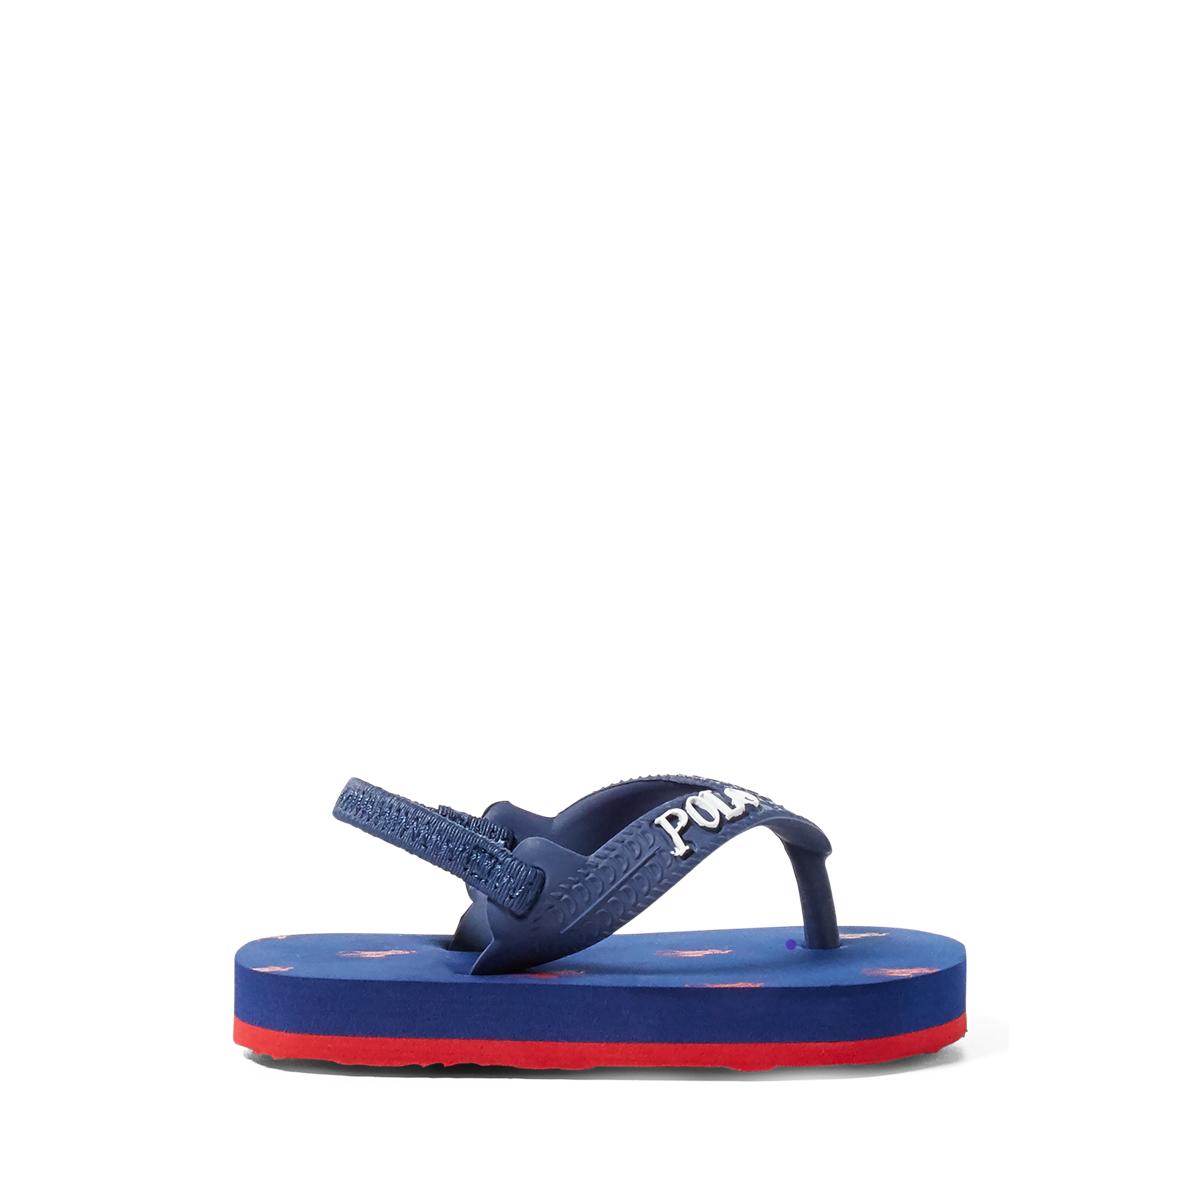 bc3177ddff9a Camino Flip-Flop - Sandals Toddler (sizes 4-10)